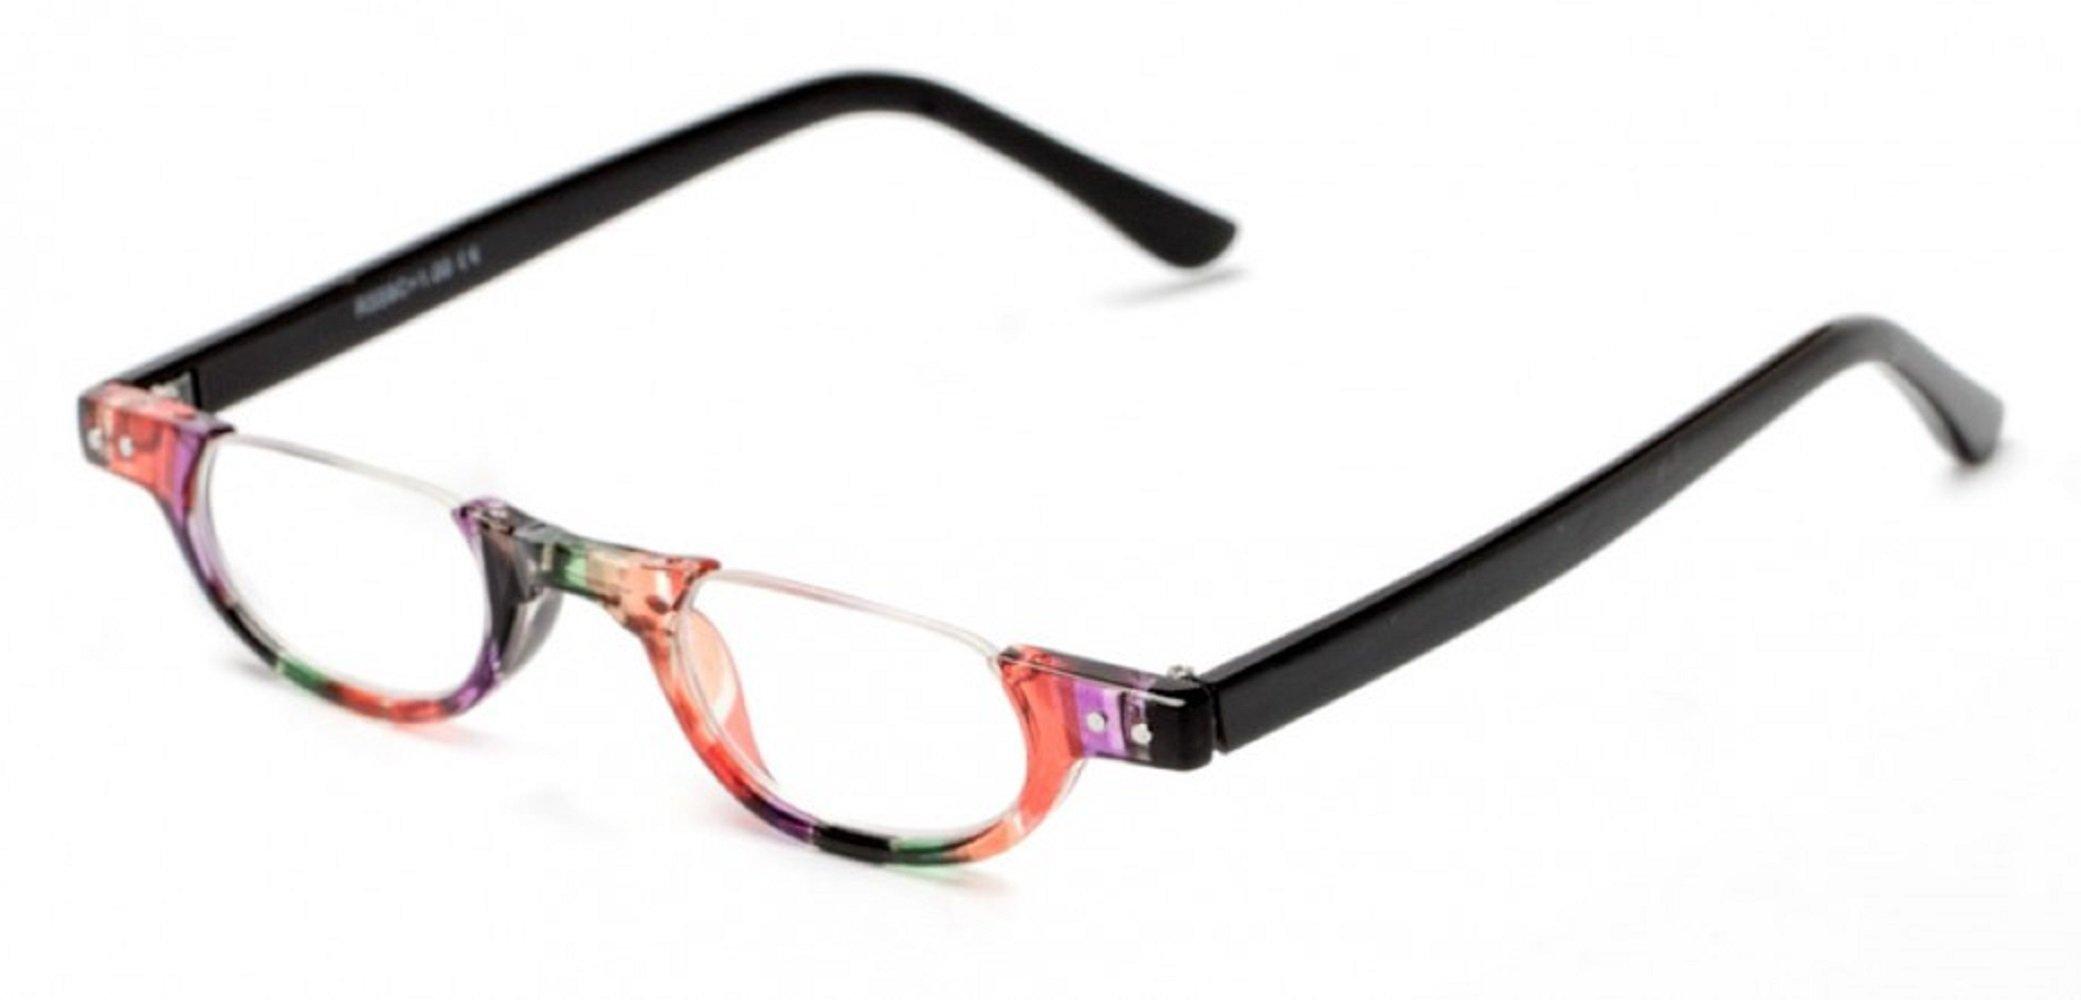 9a5d8b7699c2 The Hunter Colorful Retro Half Under Frame Rimless Round Vintage Reading  Glasses +2.00 Orange Green